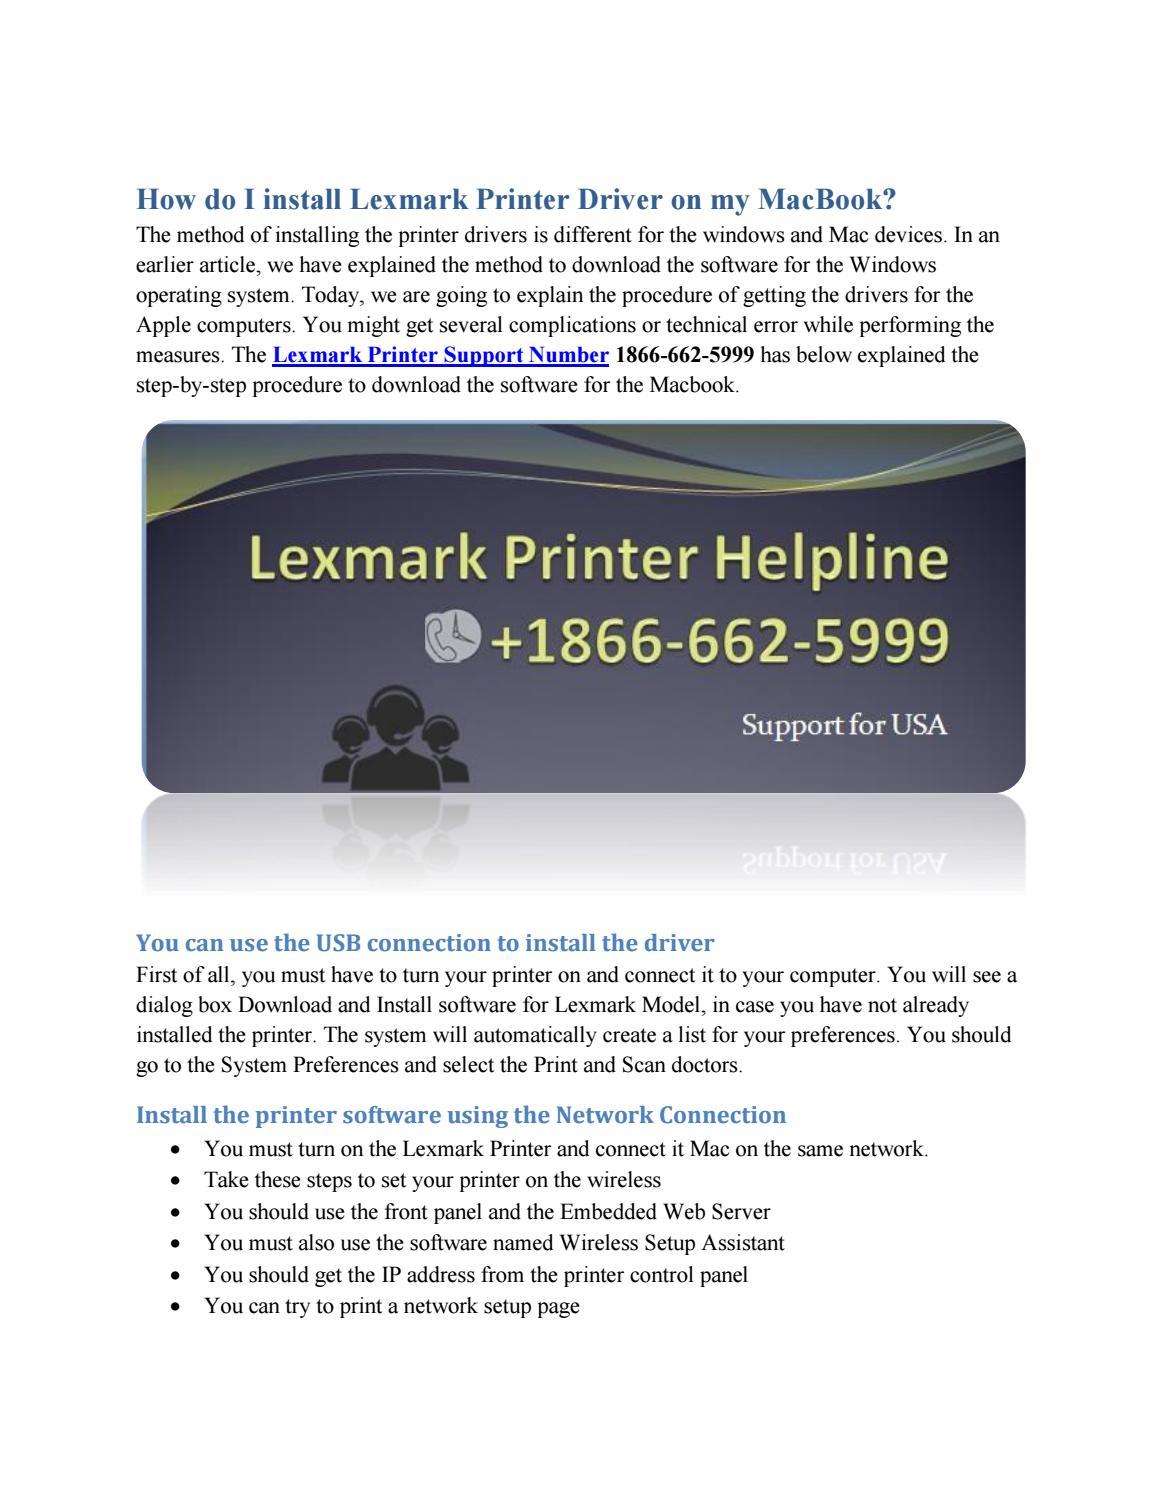 How do I install Lexmark Printer Driver on my MacBook? by